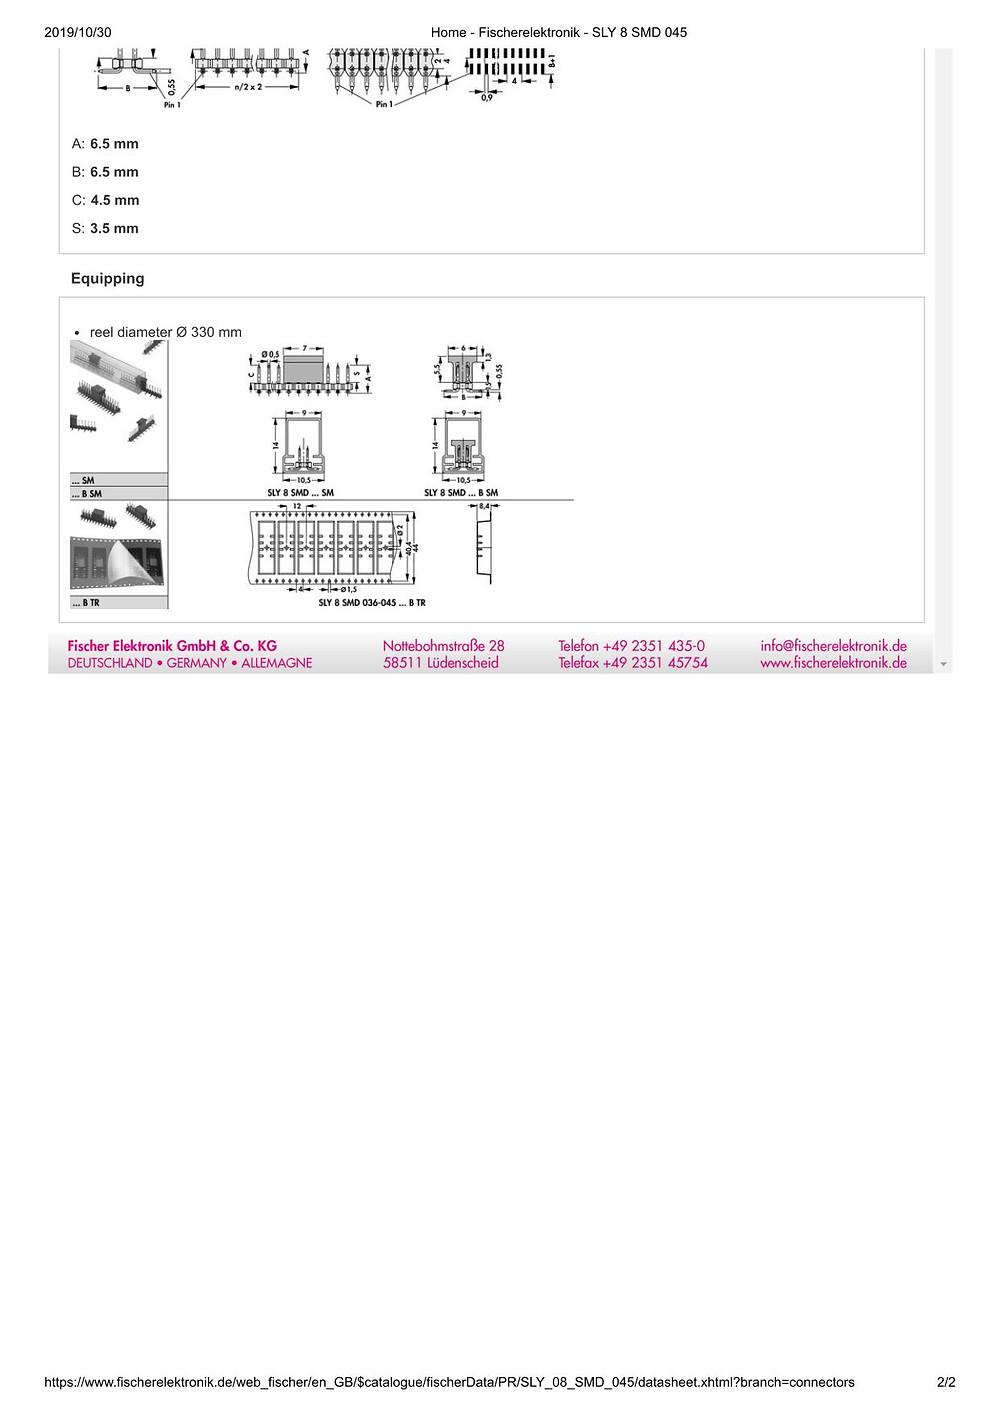 SLY 8 SMD 045 フィッシャー テープ&リール対応 ピンヘッダ 2列 2㎜ピッチ □0.5mm (1リール=650個巻)4-40ピン